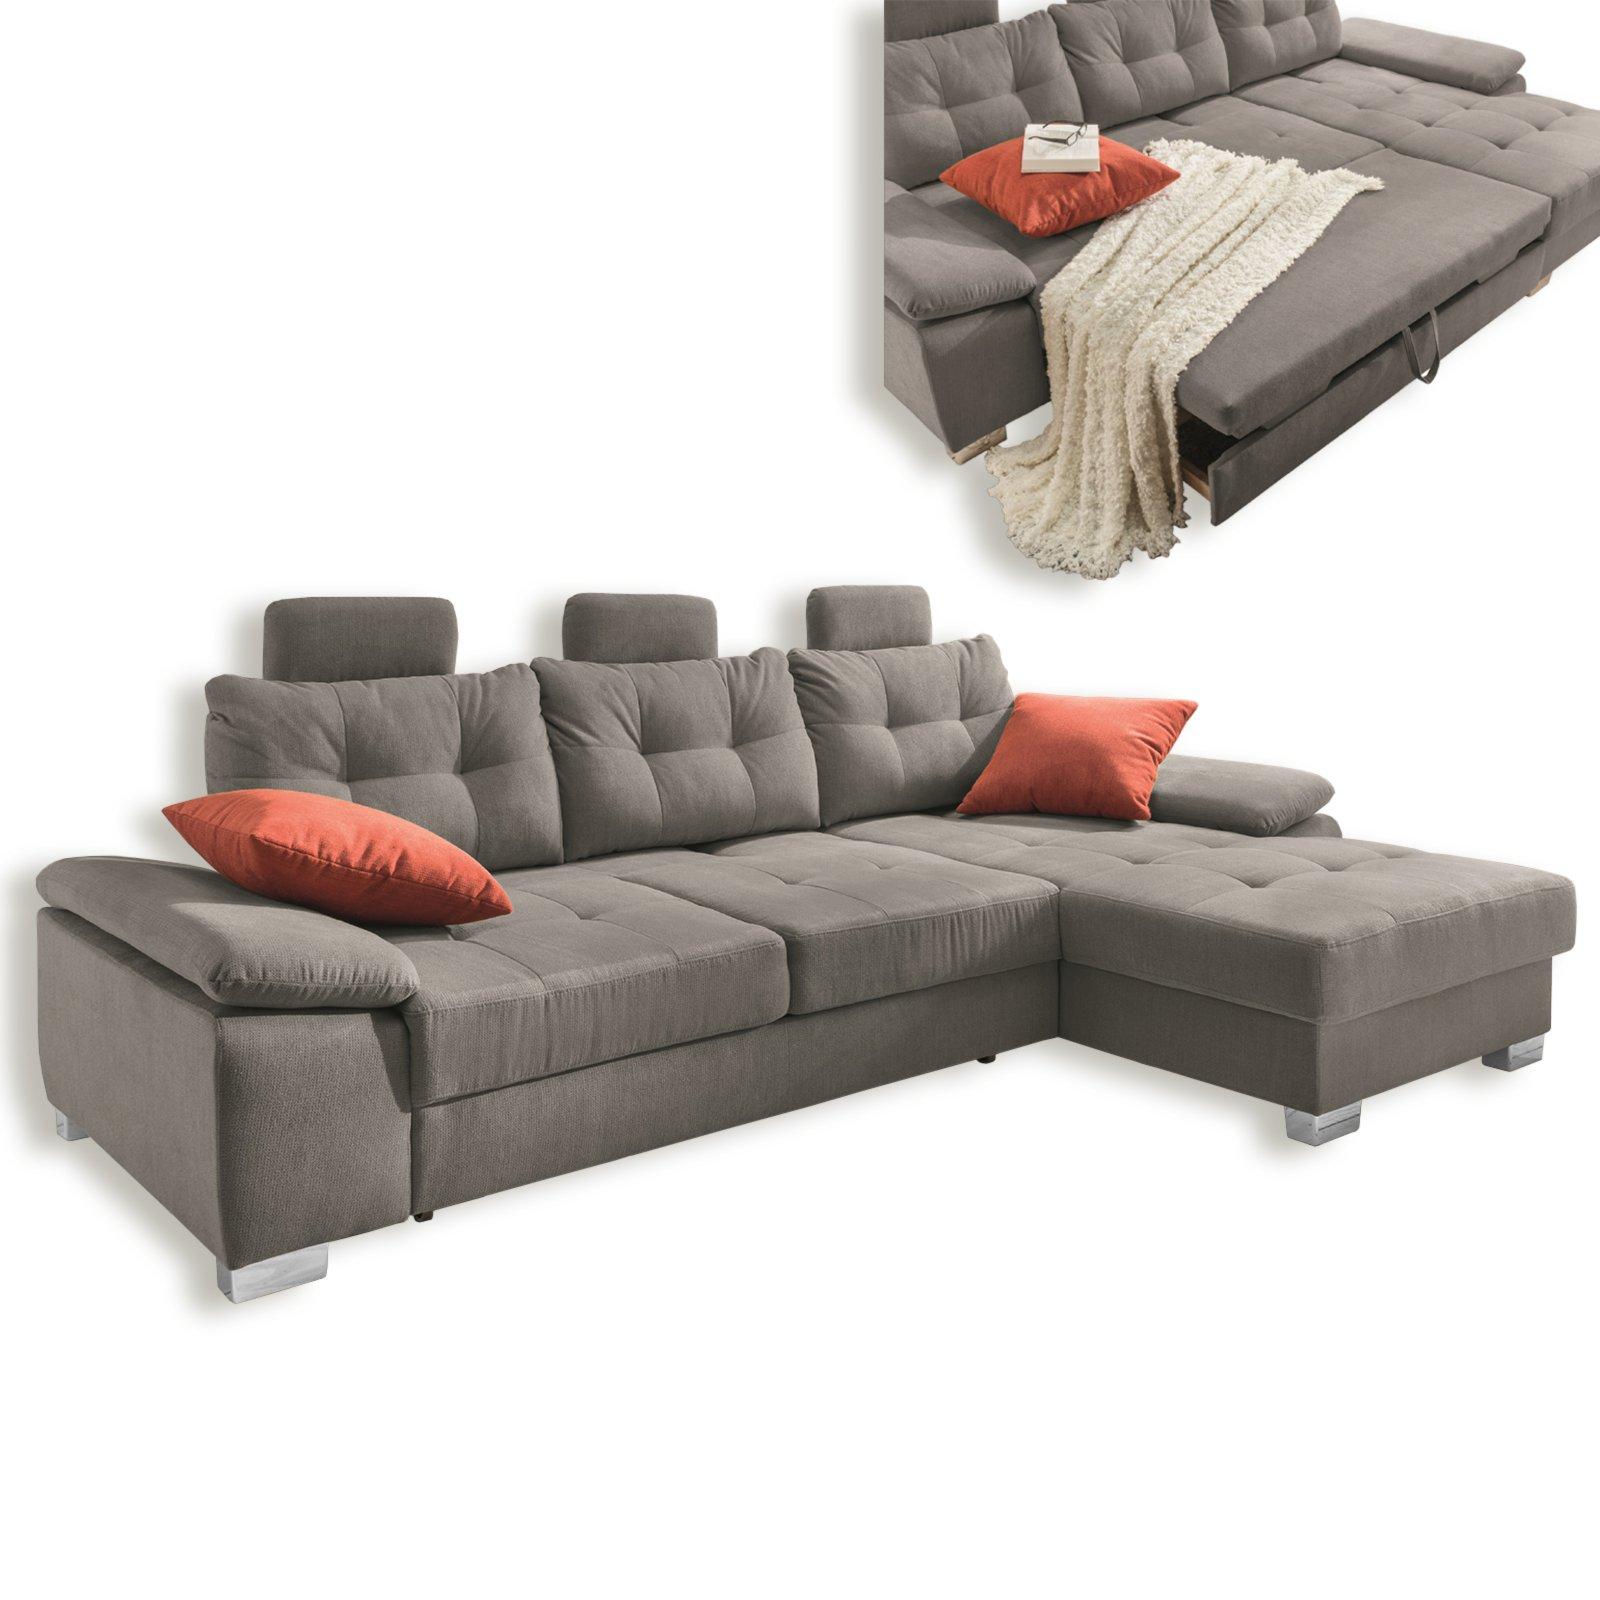 ecksofa grau mit funktionen recamiere rechts ecksofas l form sofas couches m bel. Black Bedroom Furniture Sets. Home Design Ideas